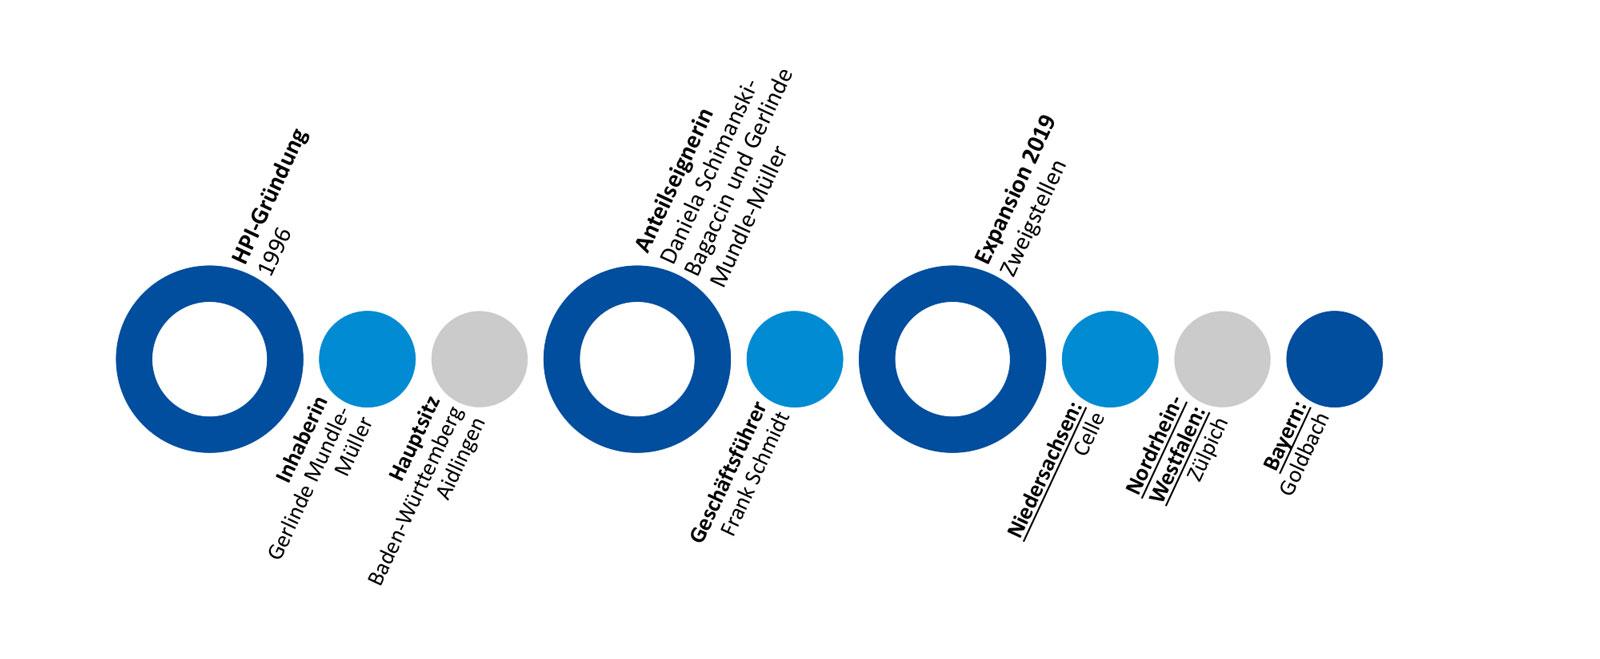 hpi-zentrum-hagel-instandsetzung-unternehmen-hpi-timeline